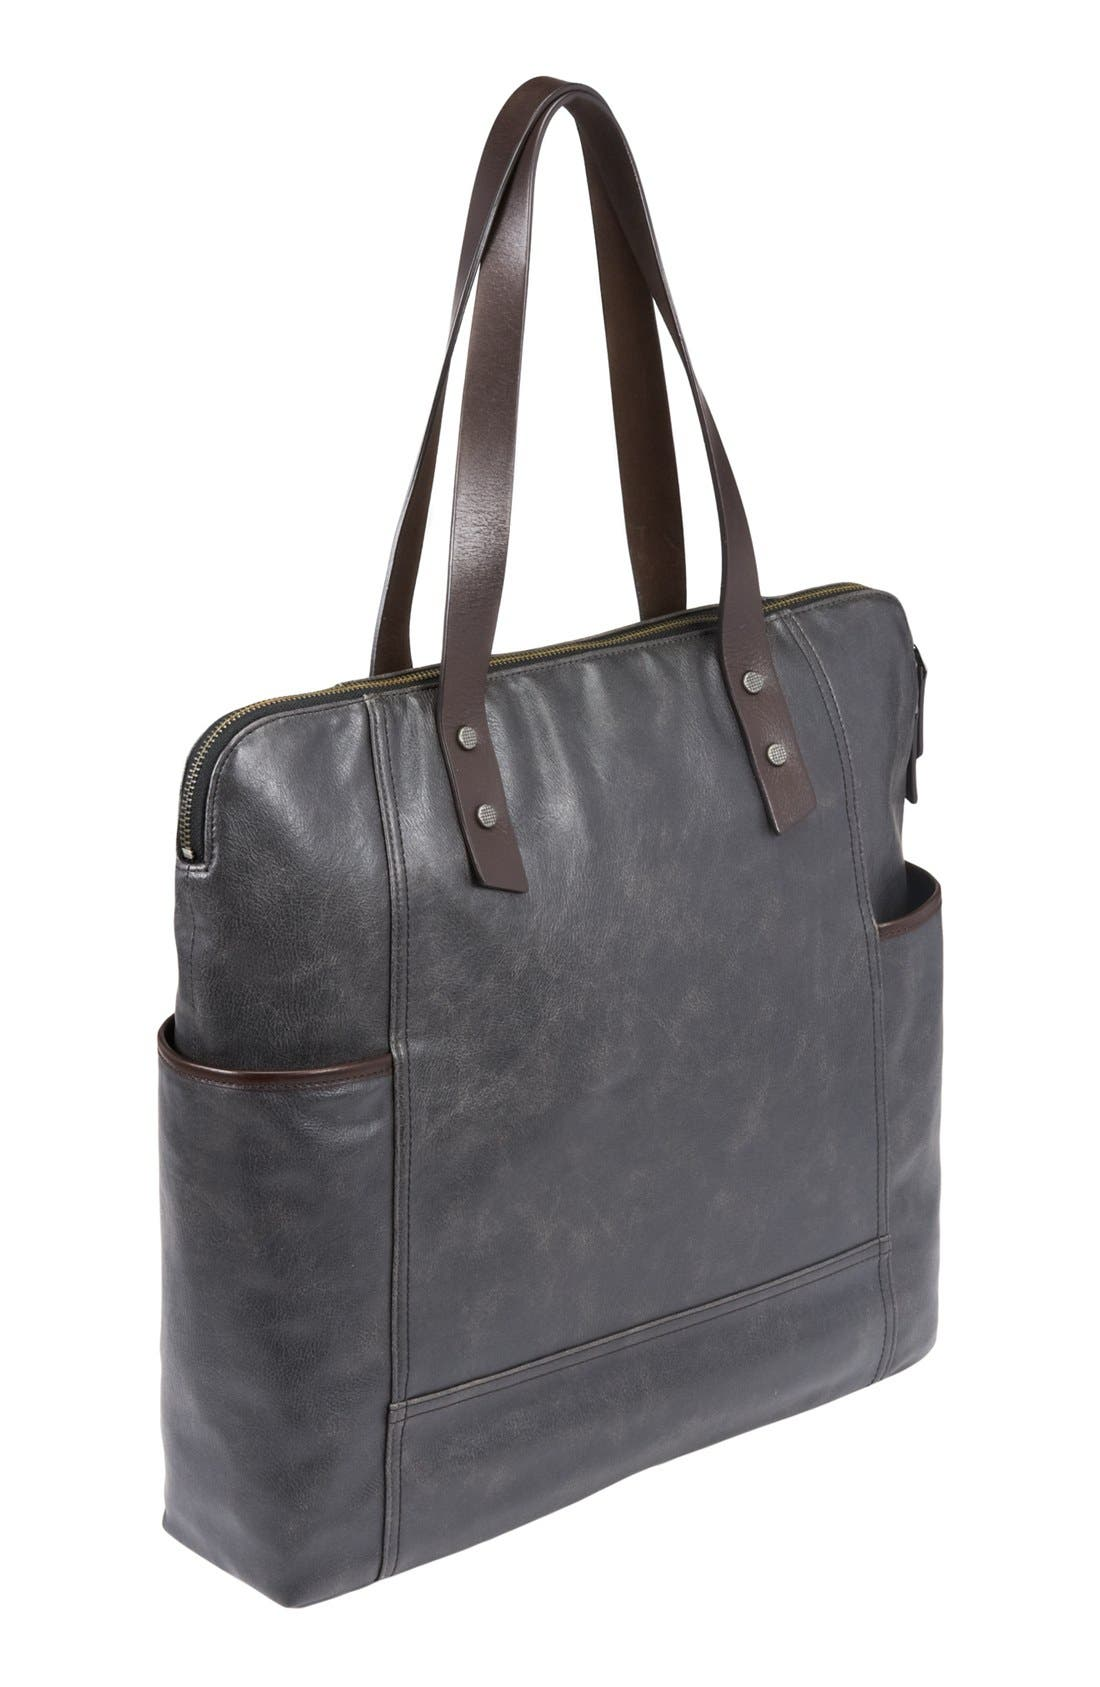 Alternate Image 2  - T-Tech by Tumi 'Forge - Sudbury' Tote Bag